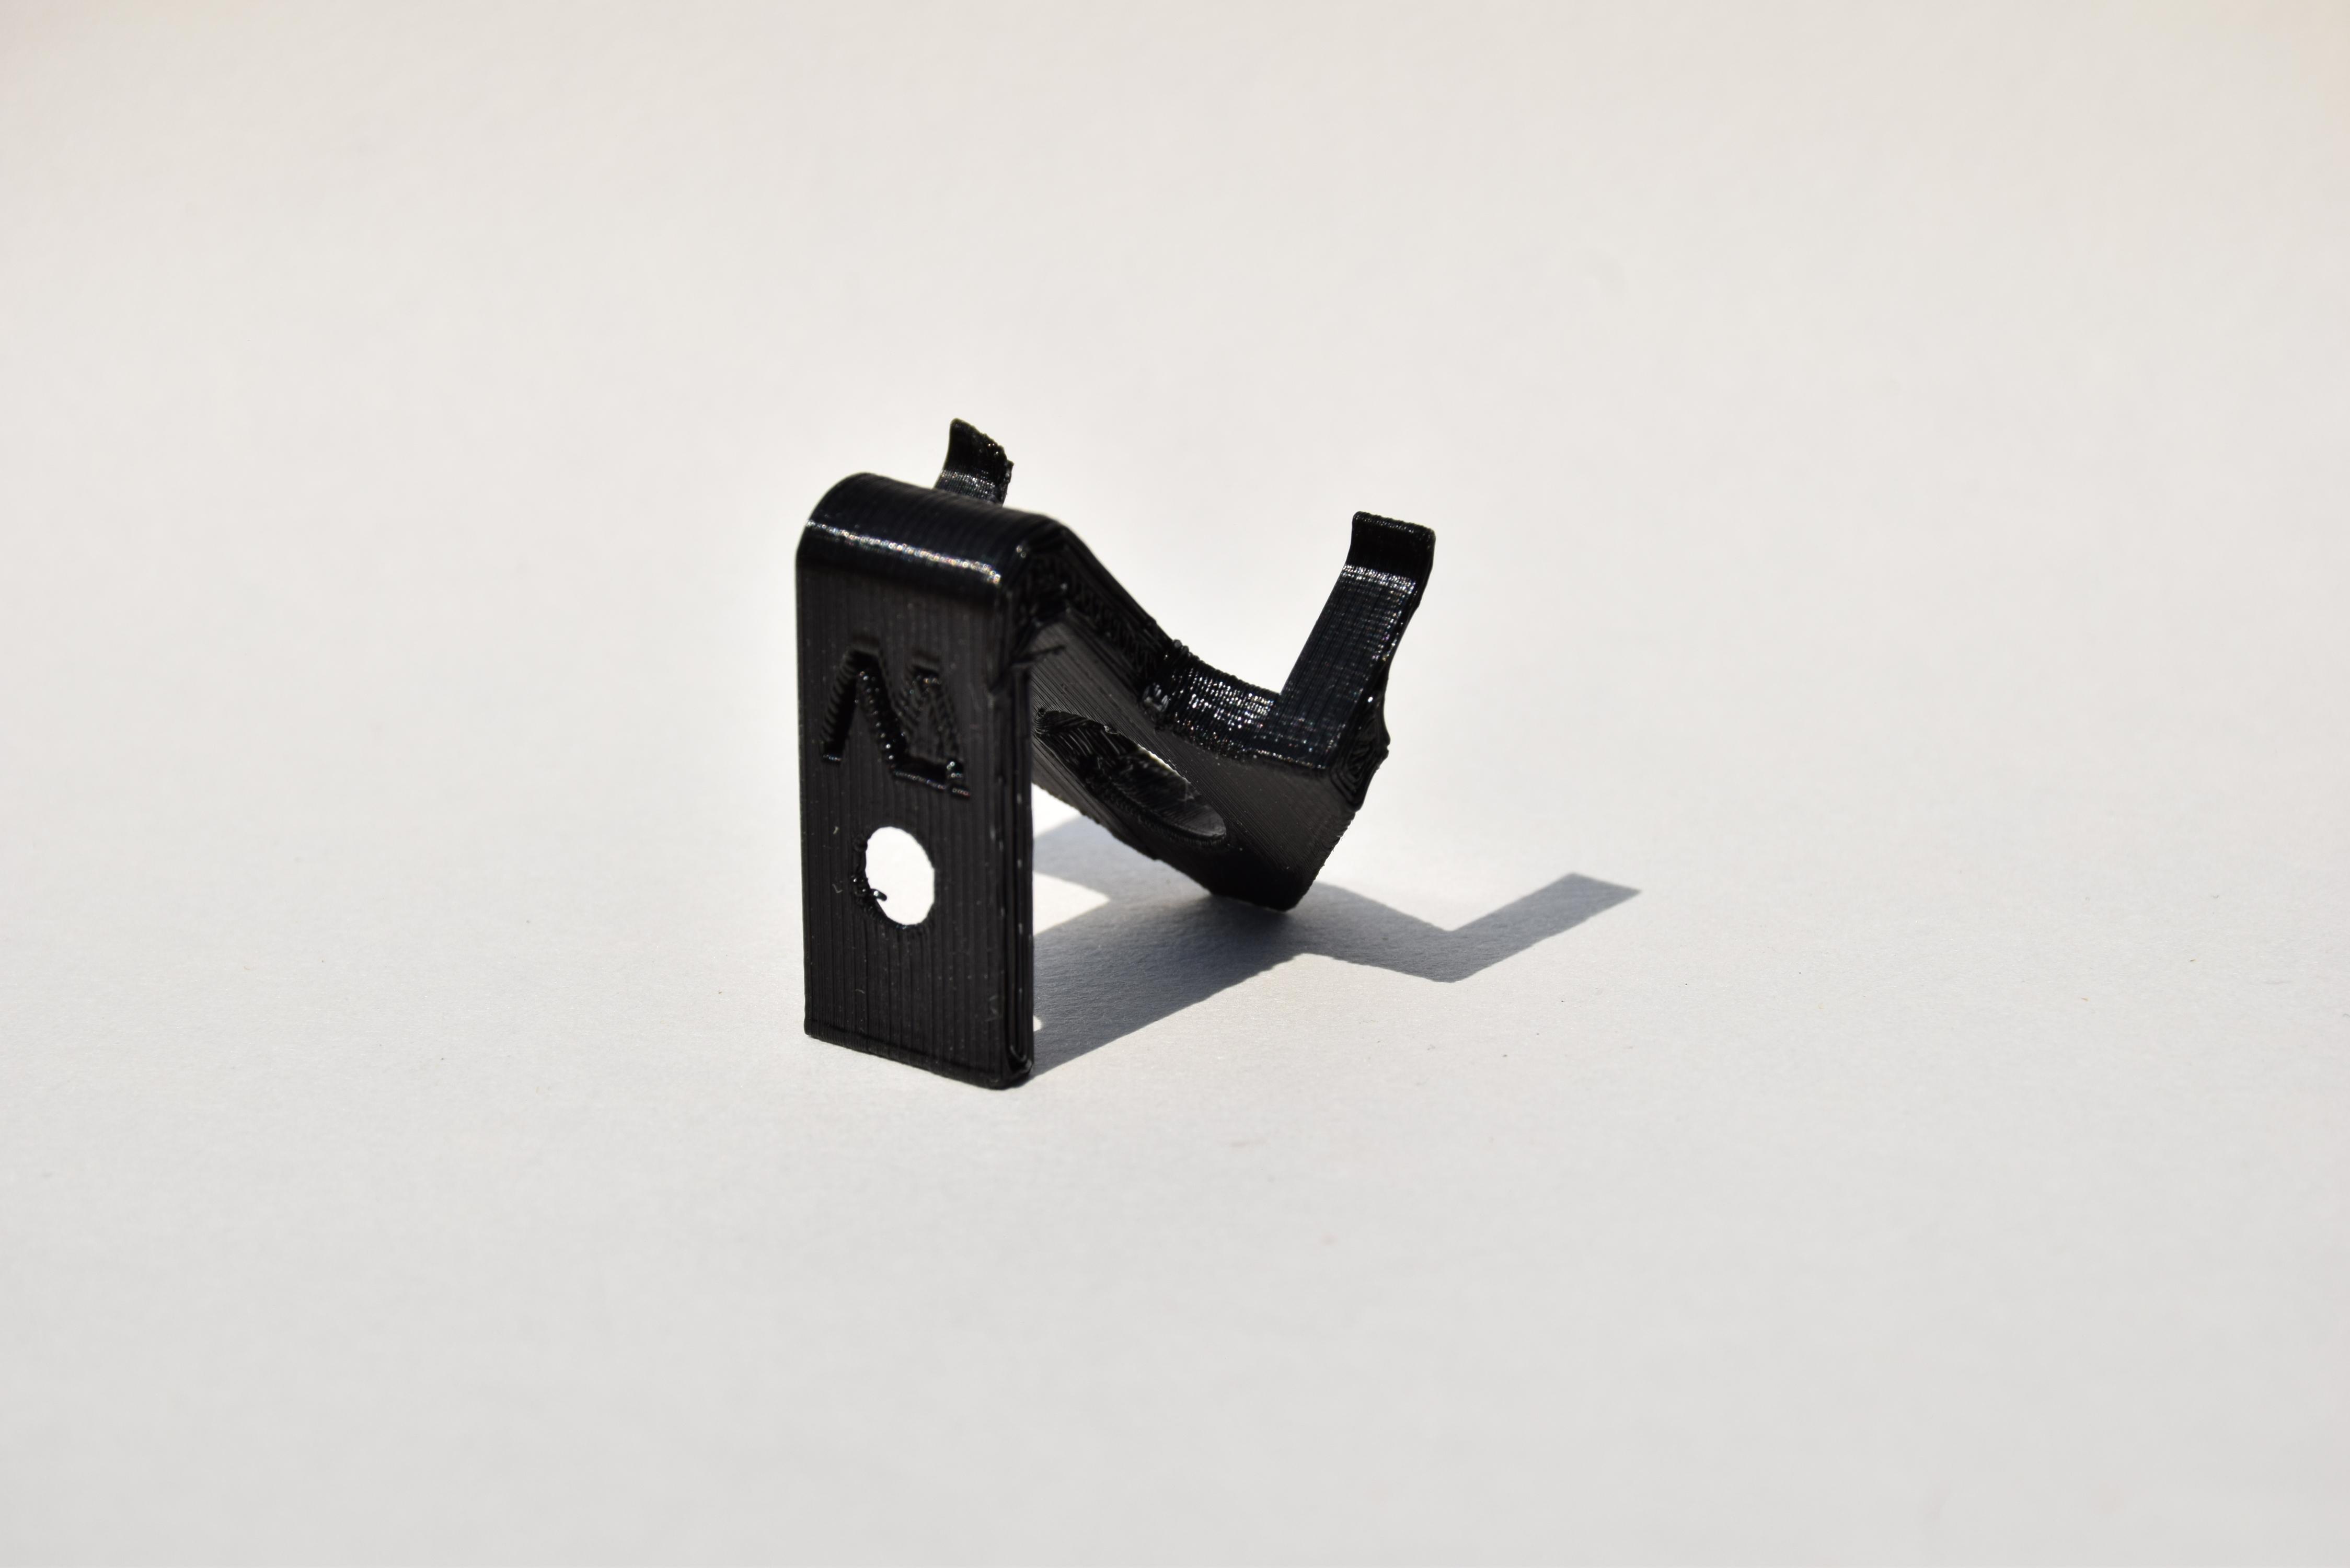 DSC_0476.JPG Download STL file Hotwheels & Diecast Car Display Mount • 3D printer model, mistry3design